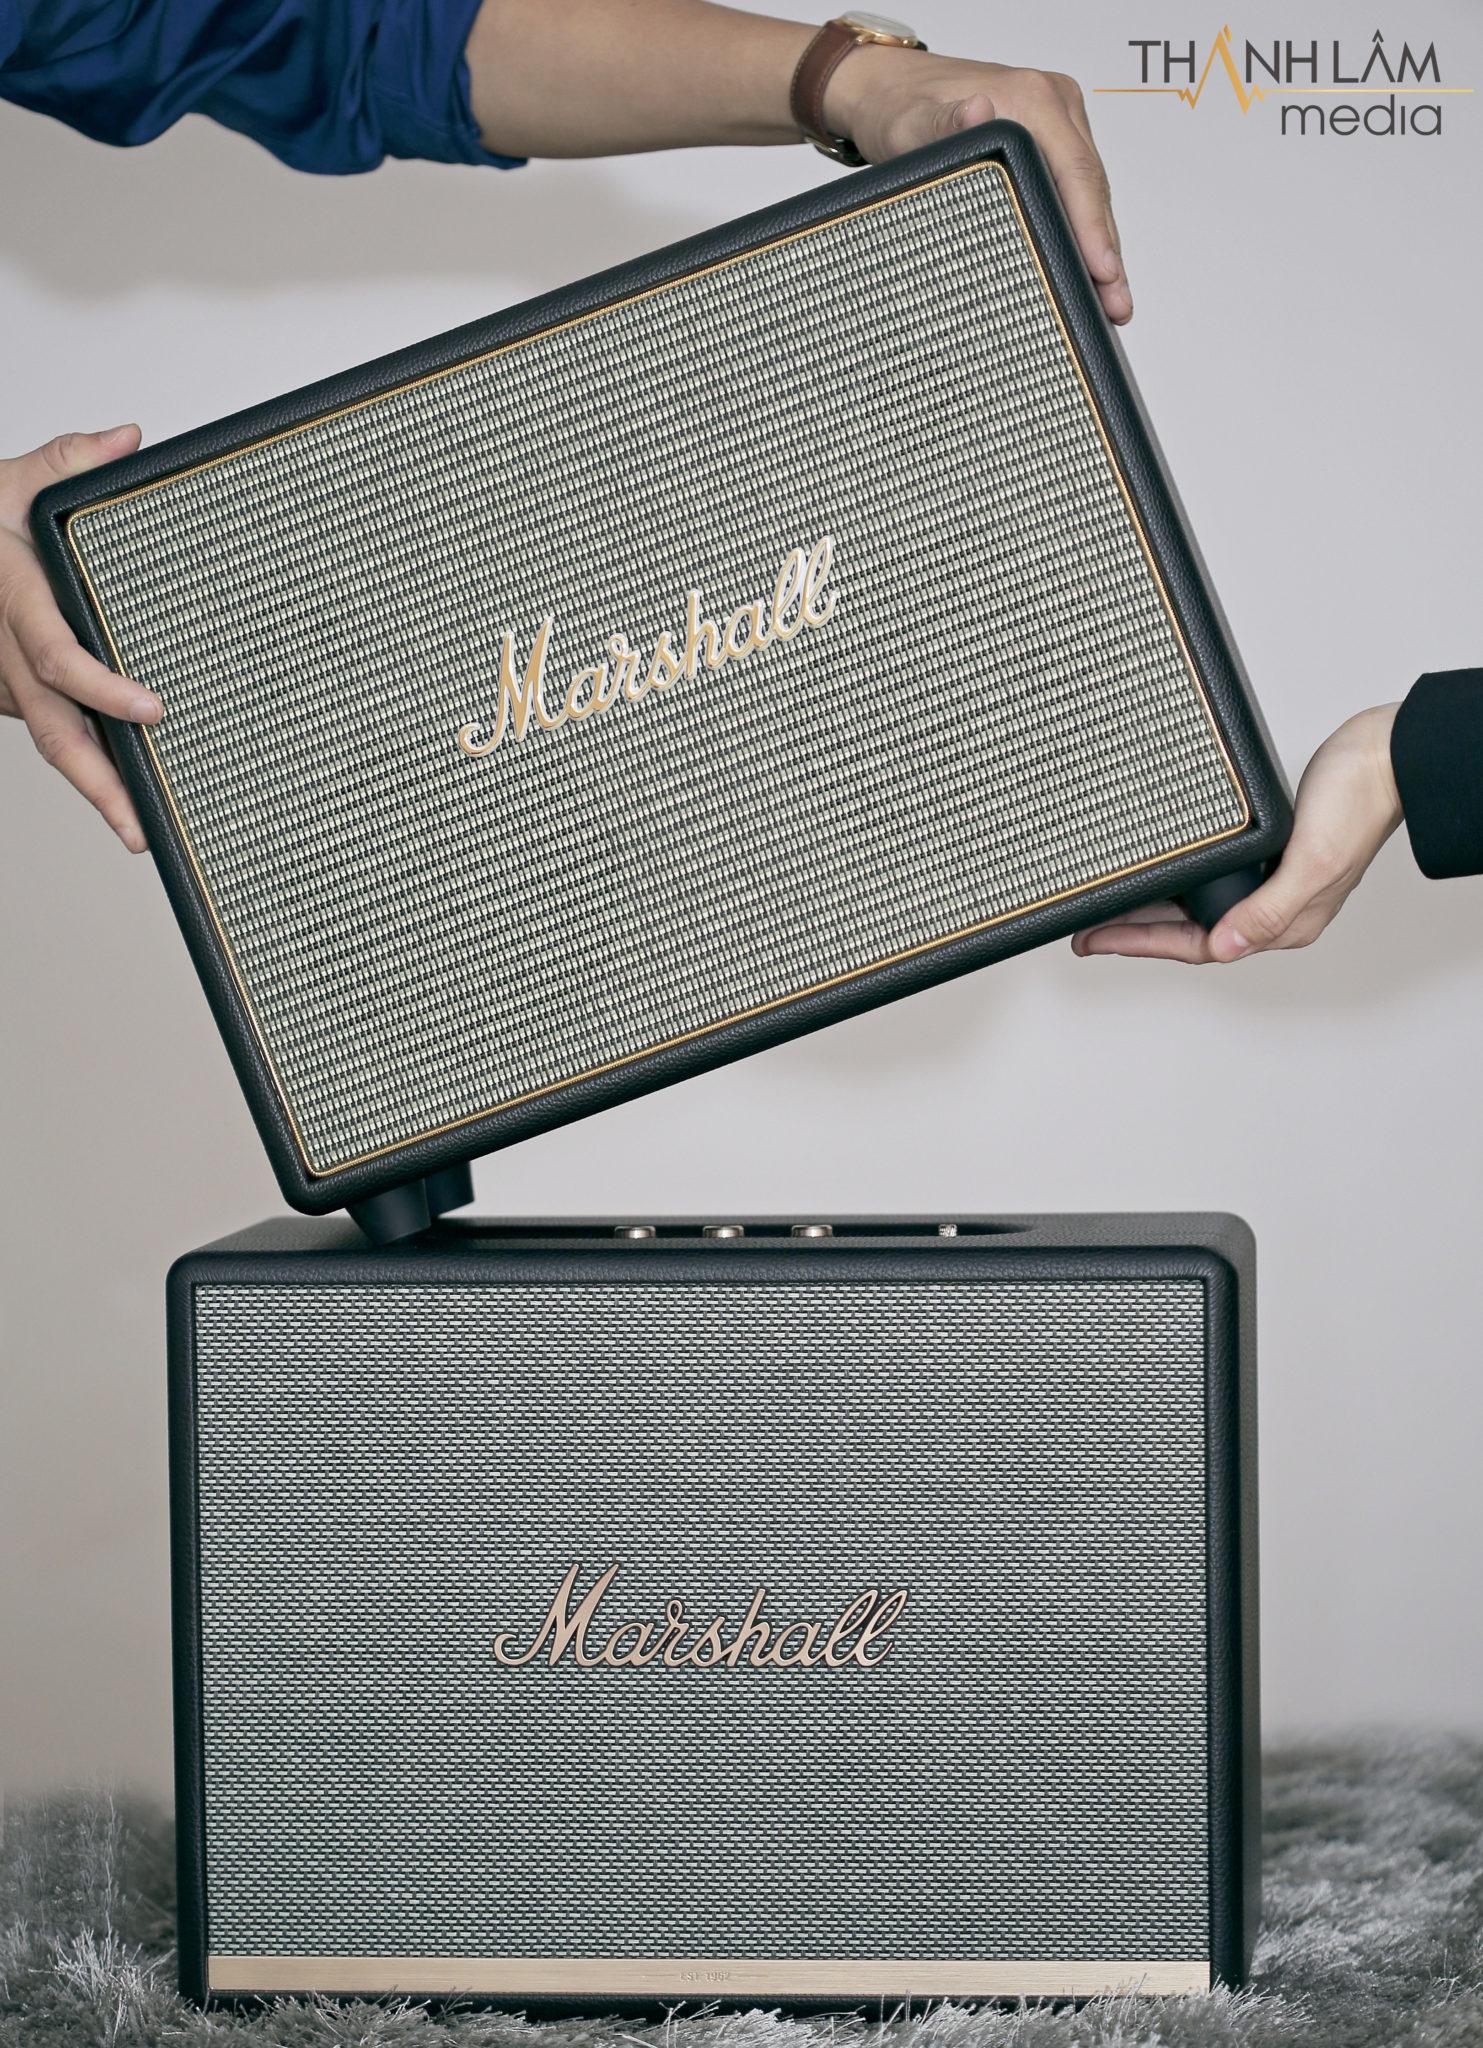 Loa Marshall Woburn vs Marshall Woburn II